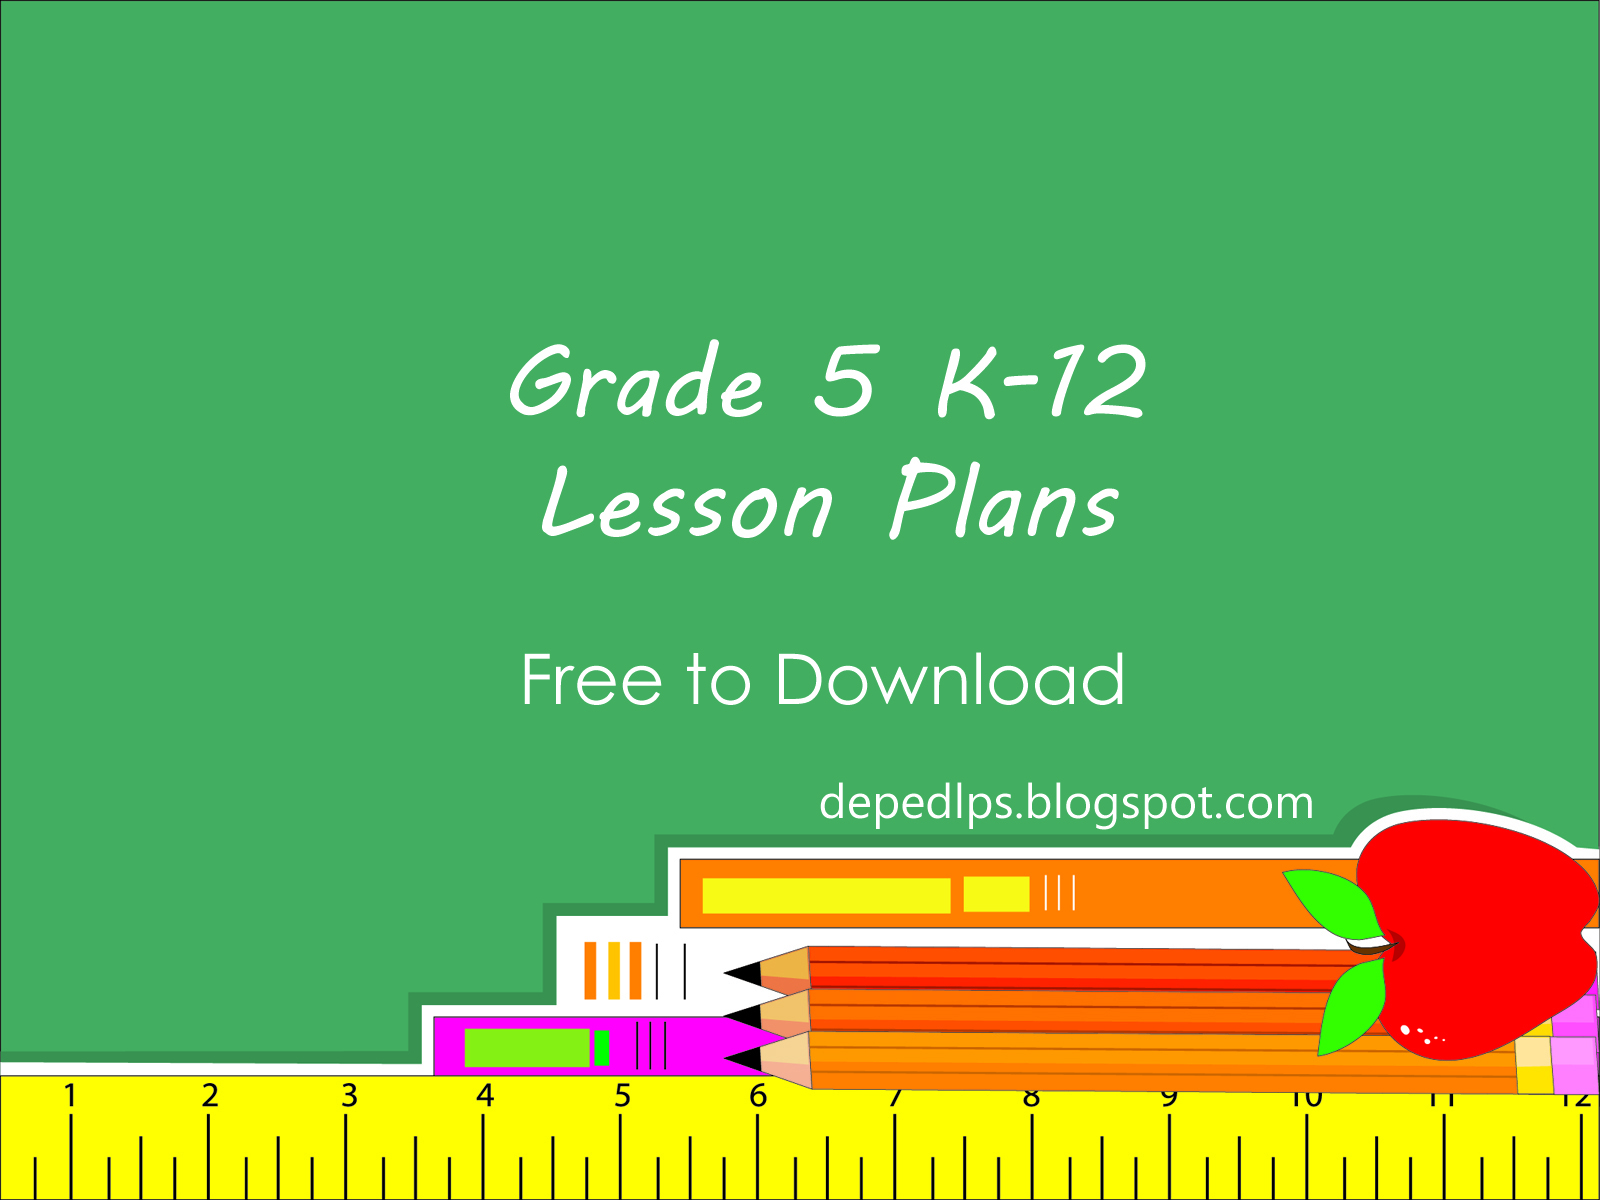 Grade 5 K12 Lesson Plans